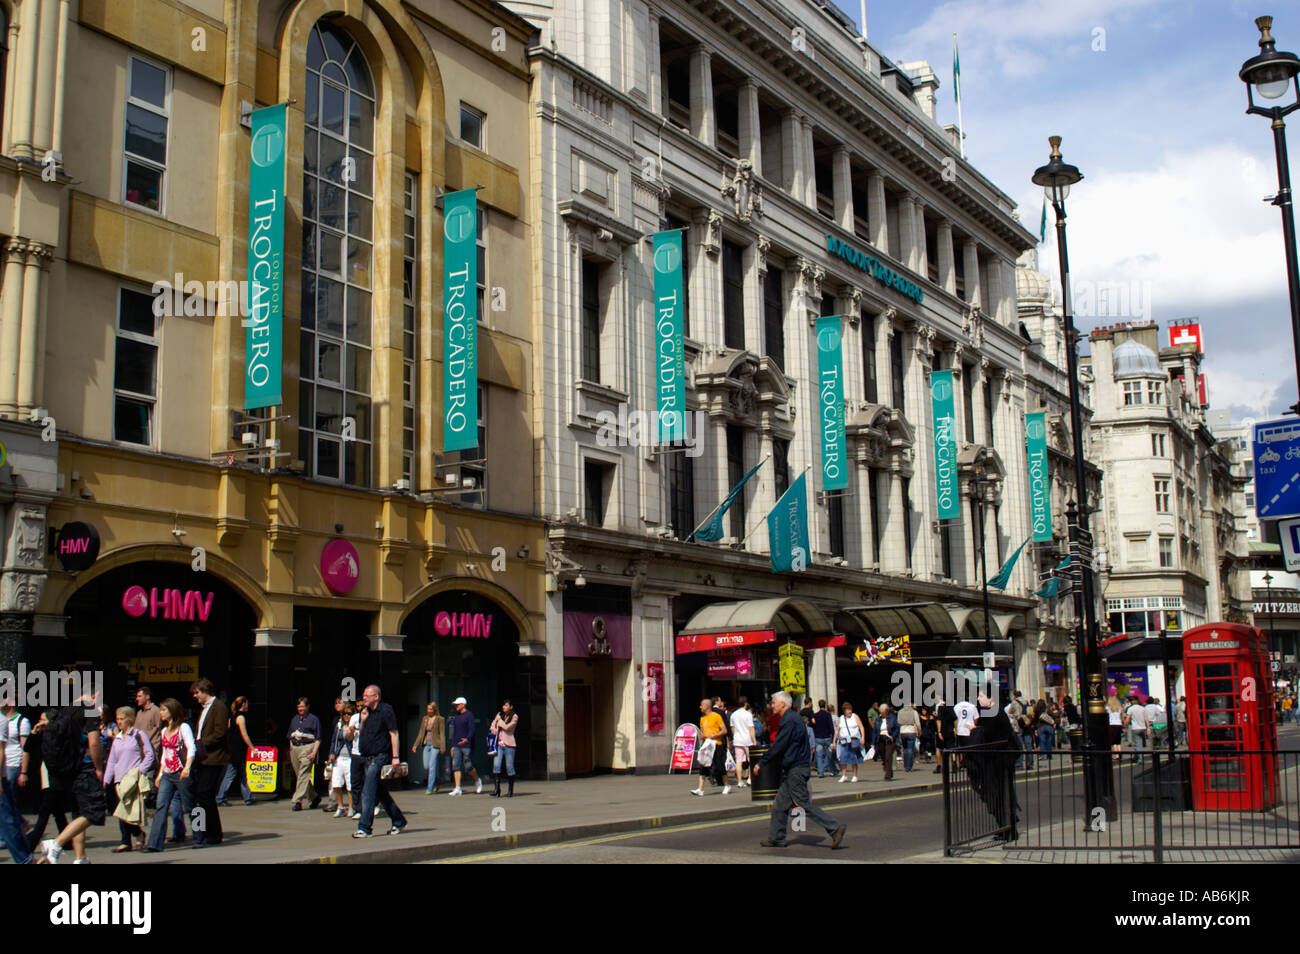 The London Trocadero at Picadilly Circus London England UK - Stock Image